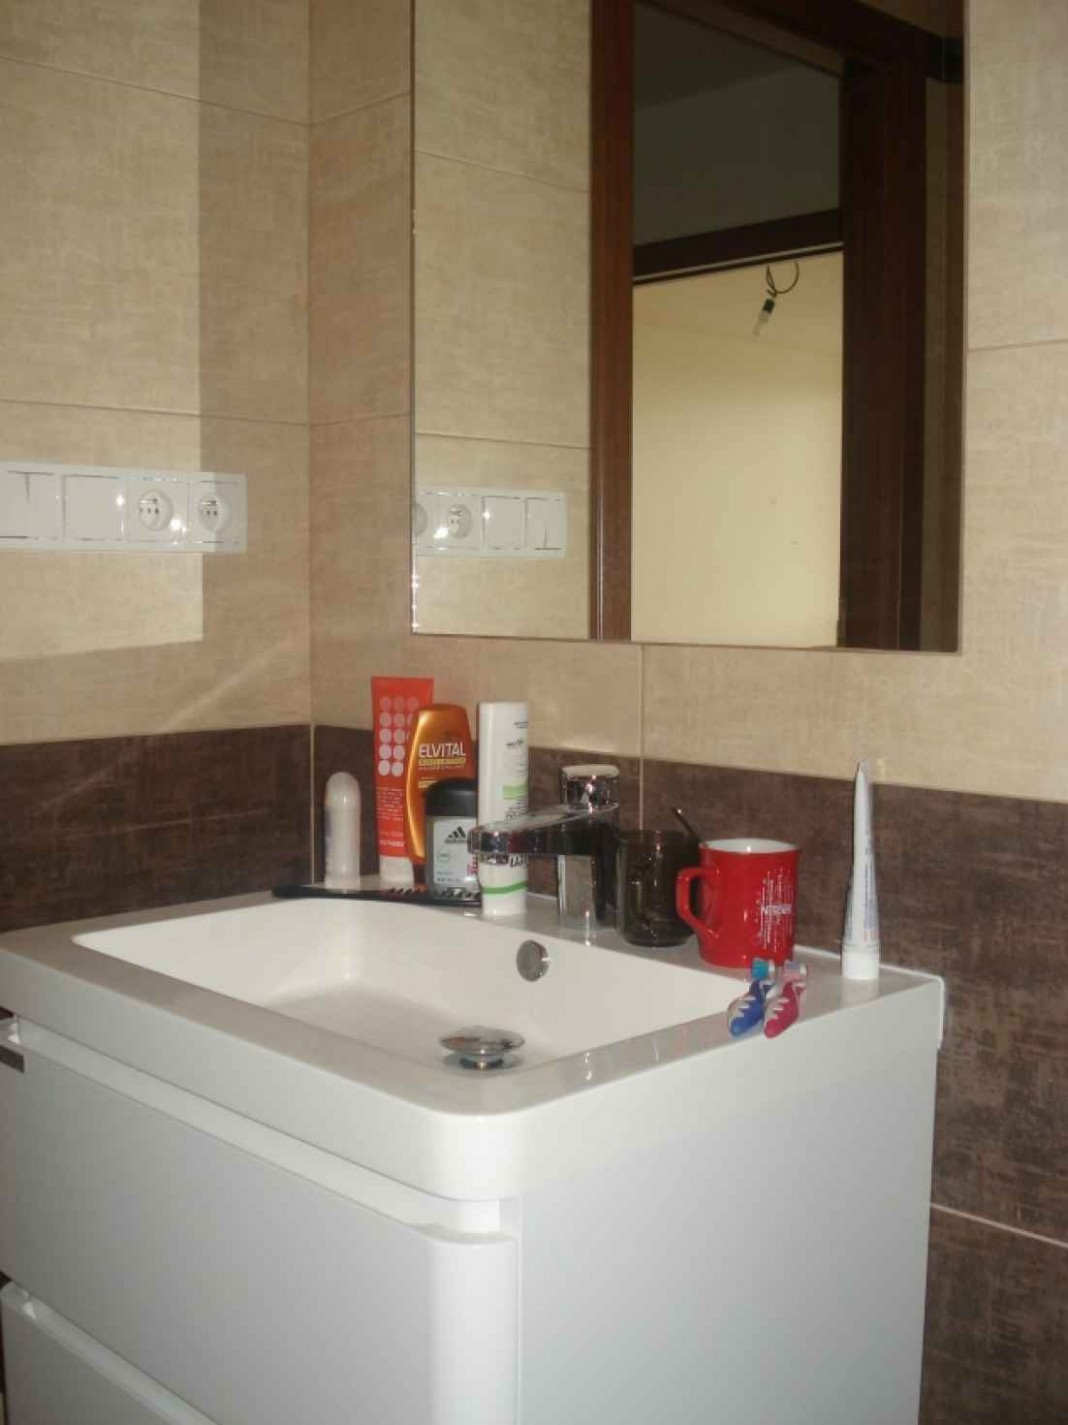 Rekonstrukce koupelny-Rekonstrukce koupelny